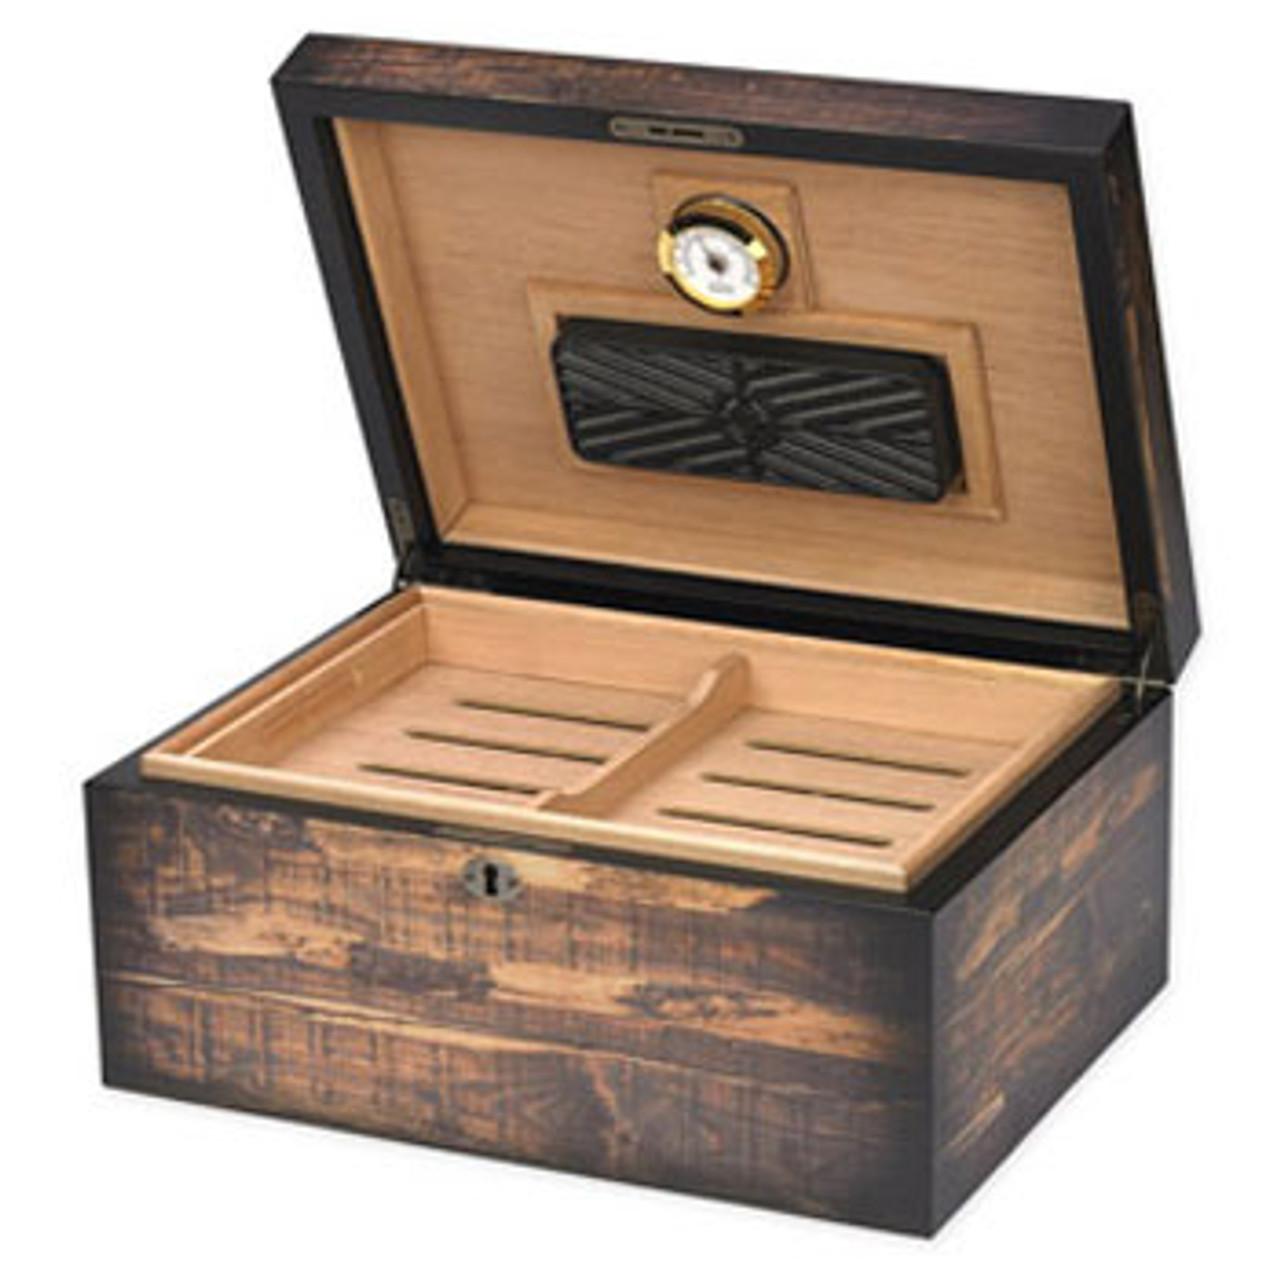 Desktop Cigar Humidor: Adirondack 100 Cigar Desktop Humidor